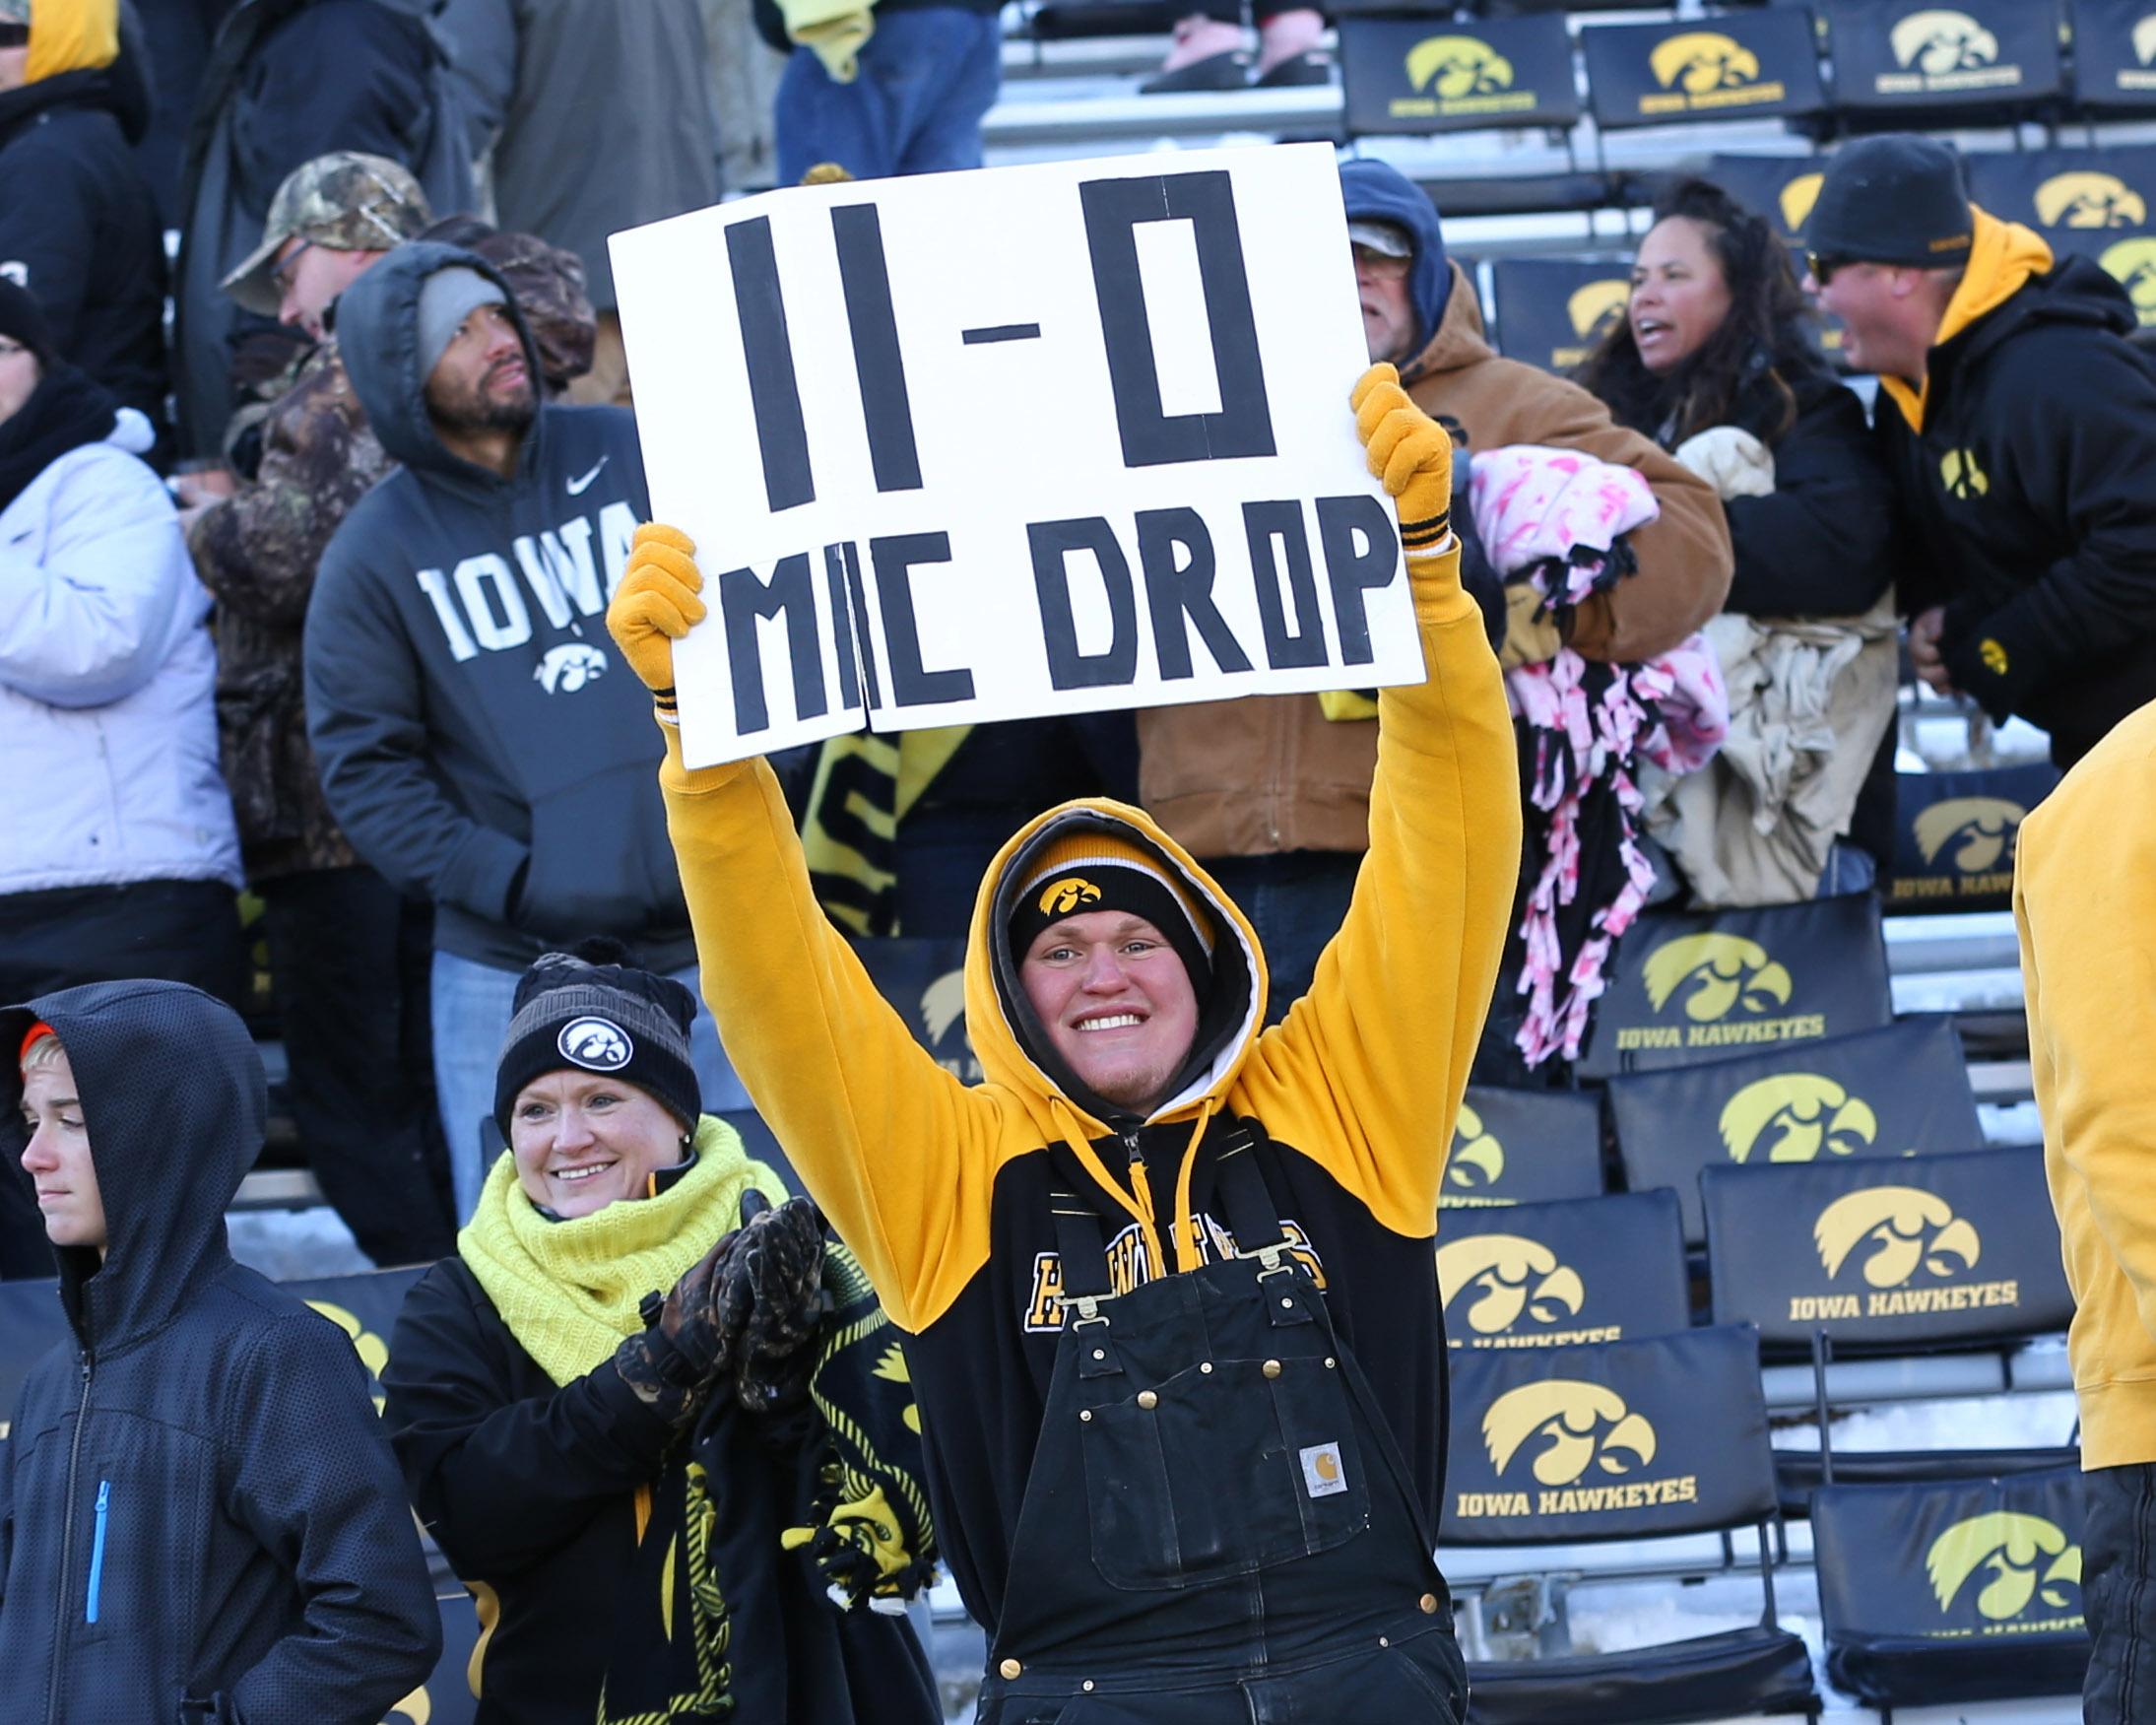 Purdue helped make that happen!